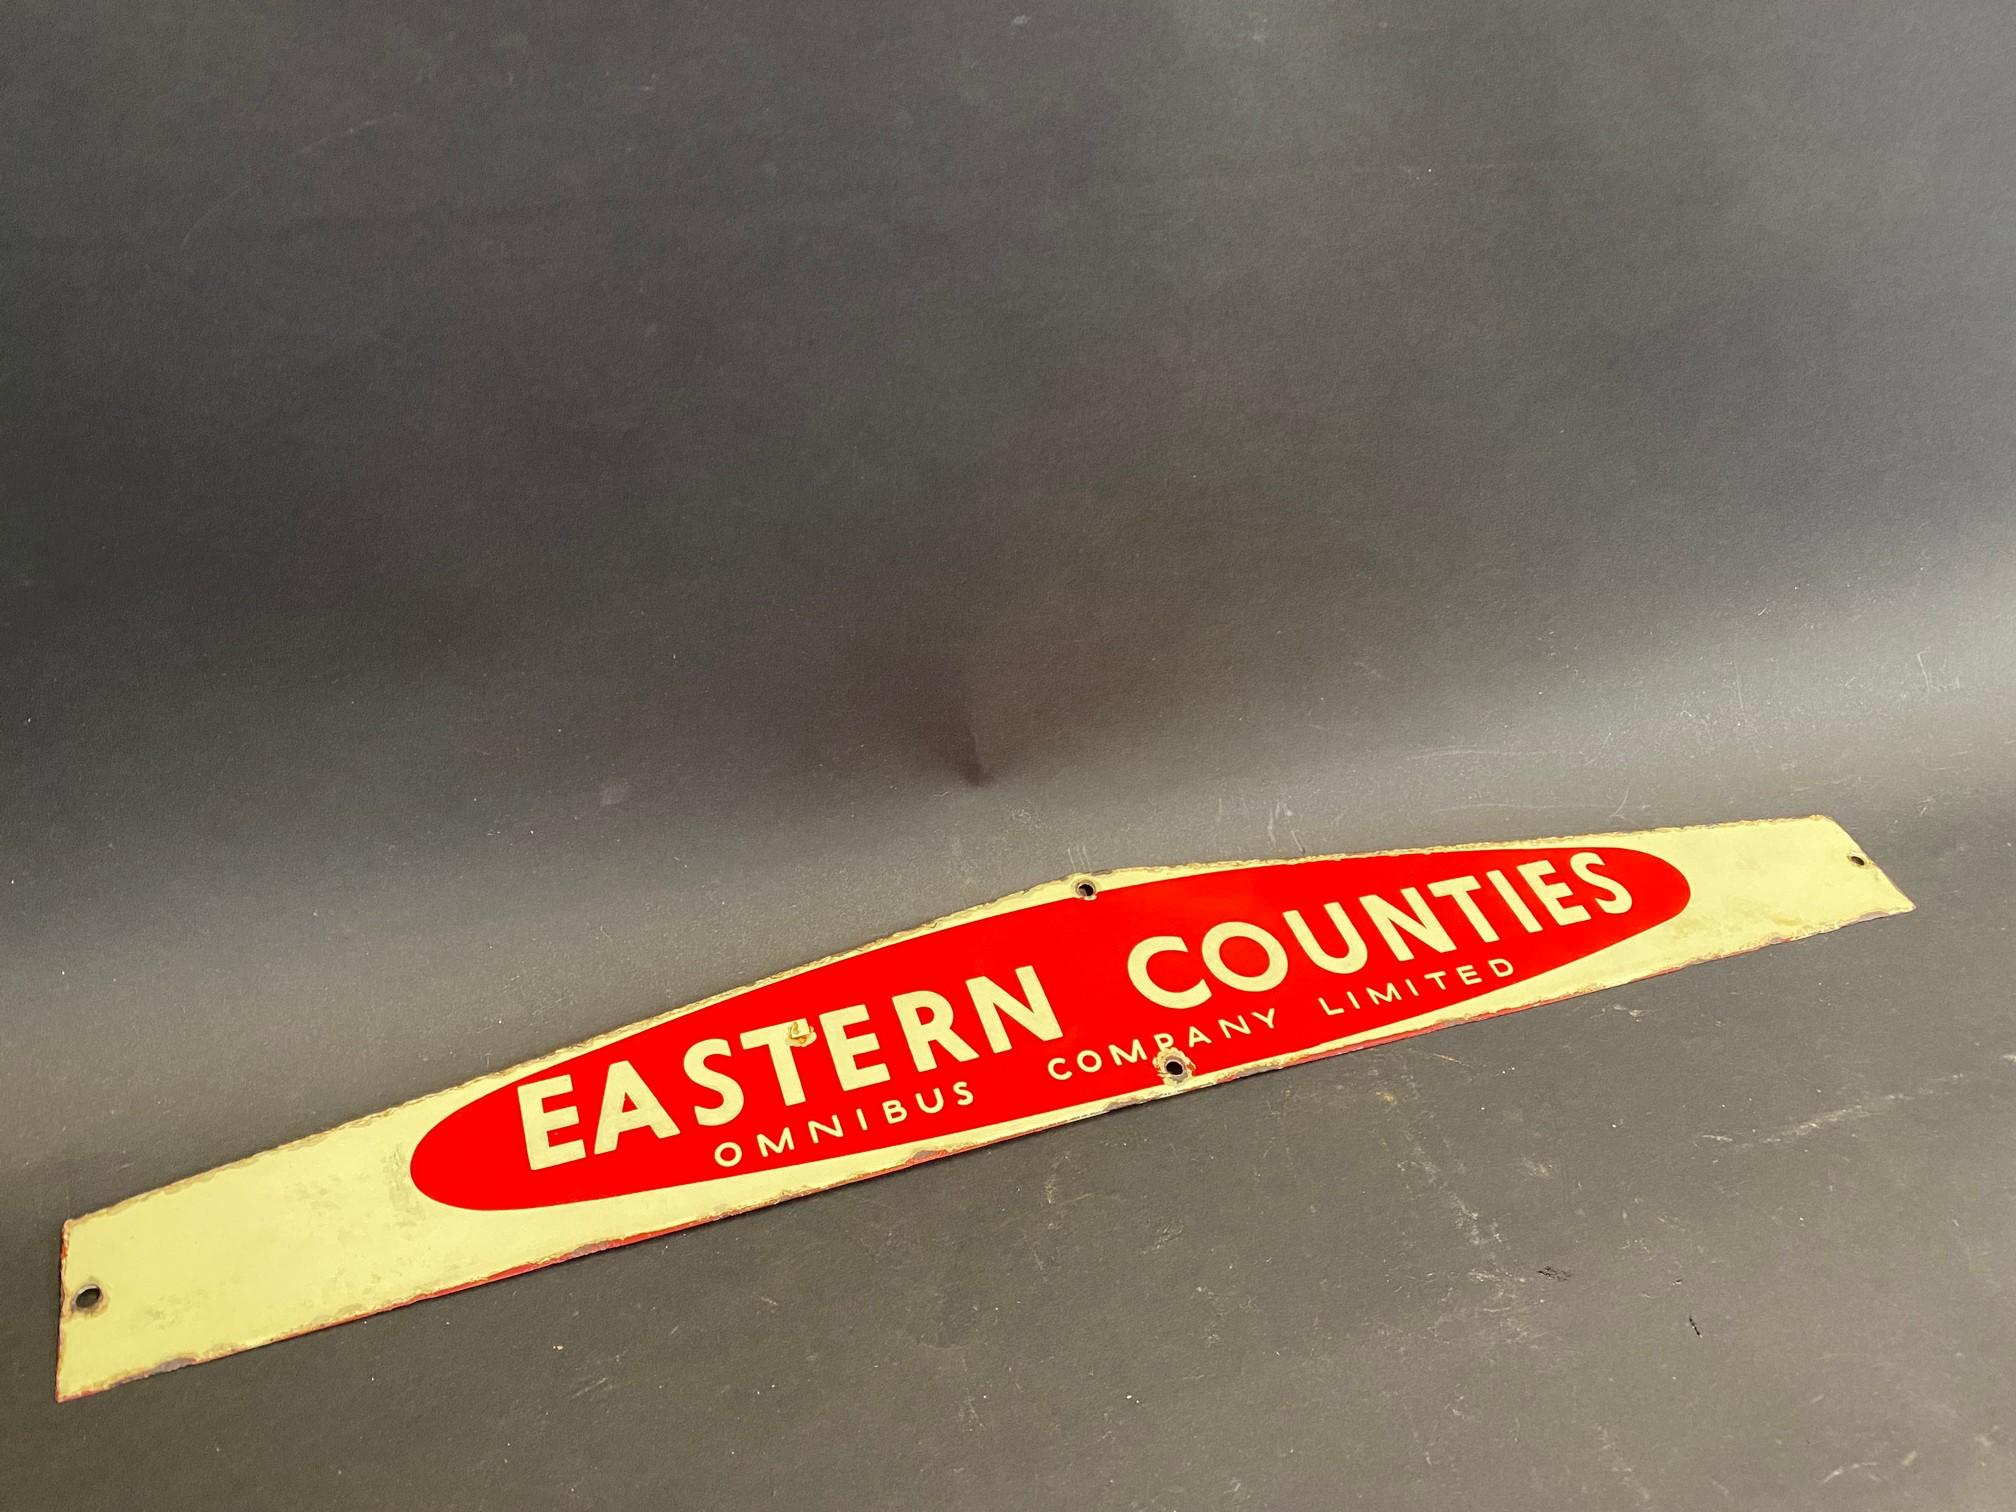 "An Eastern Counties enamel notice board header sign, 22 1/2 x 3 1/4""."